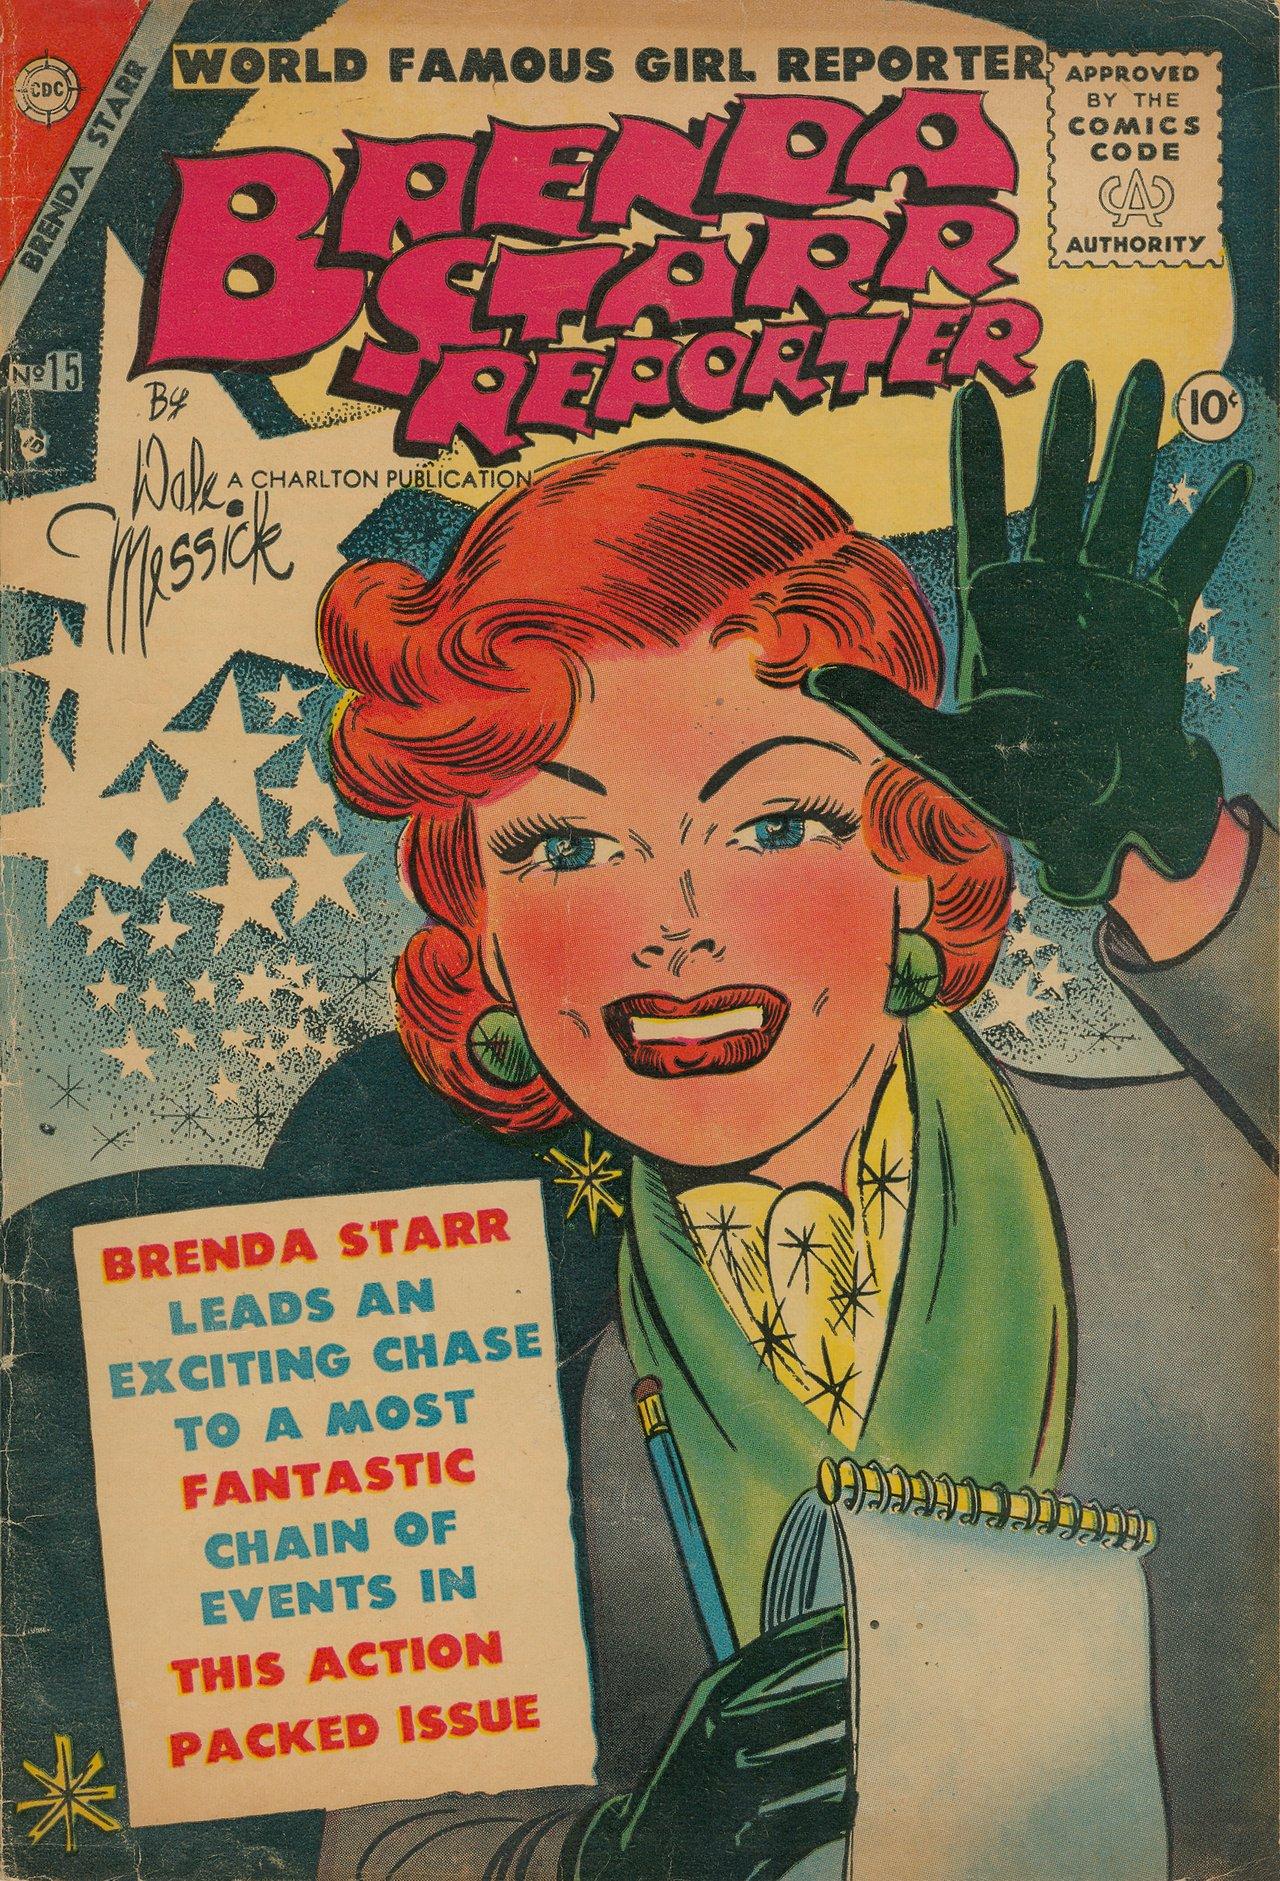 828b97098 Brenda Starr: Challenging or Embracing Gender Stereotypes?